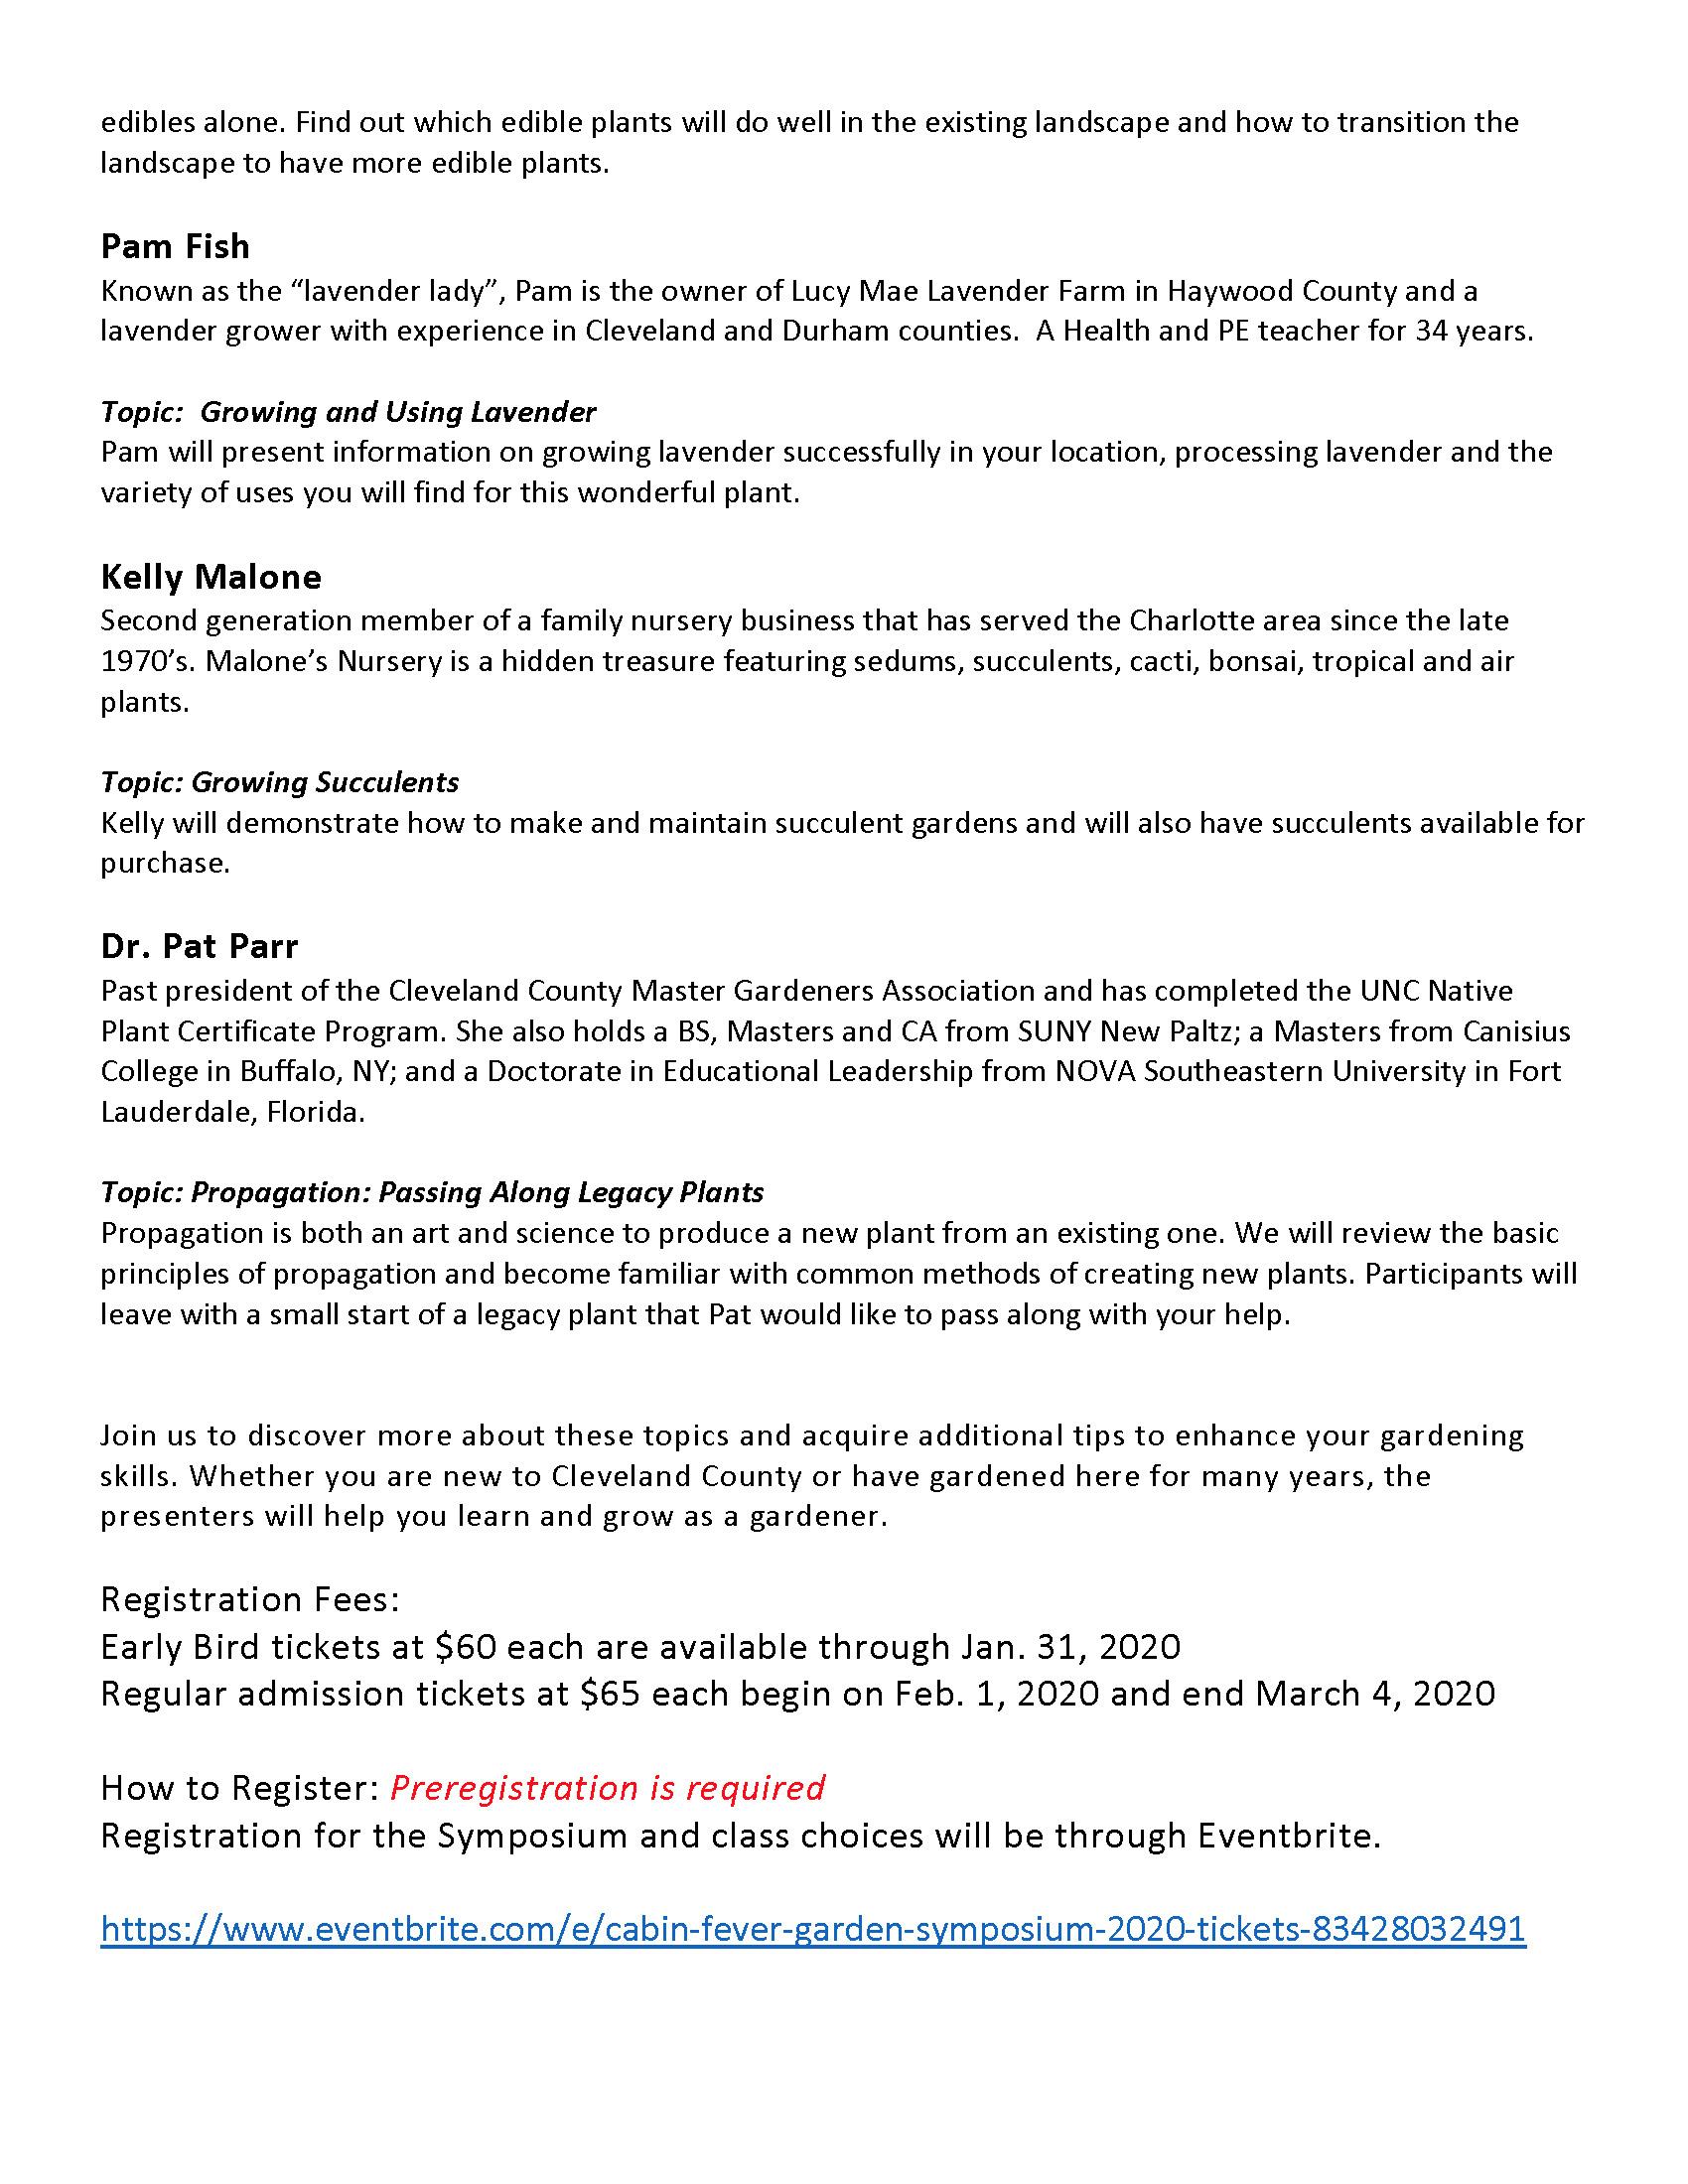 Symposium flyer page 2